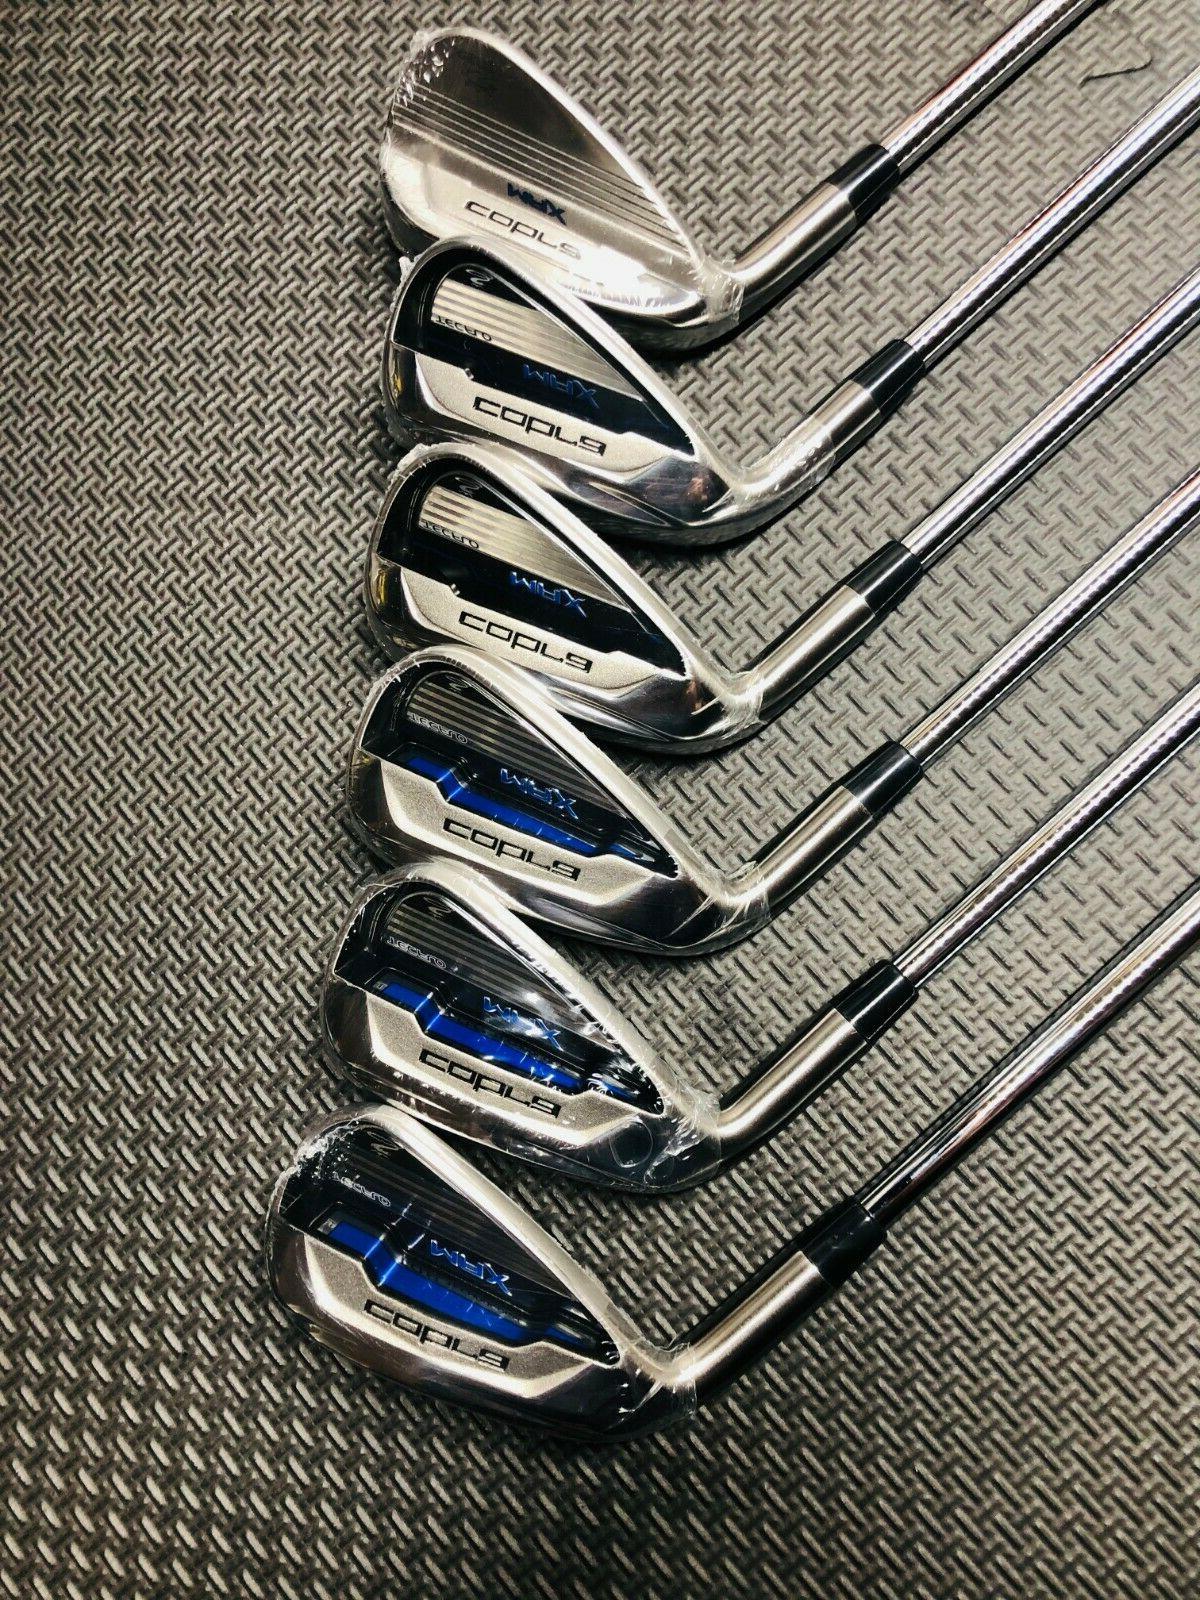 new max irons set 6 pw gw